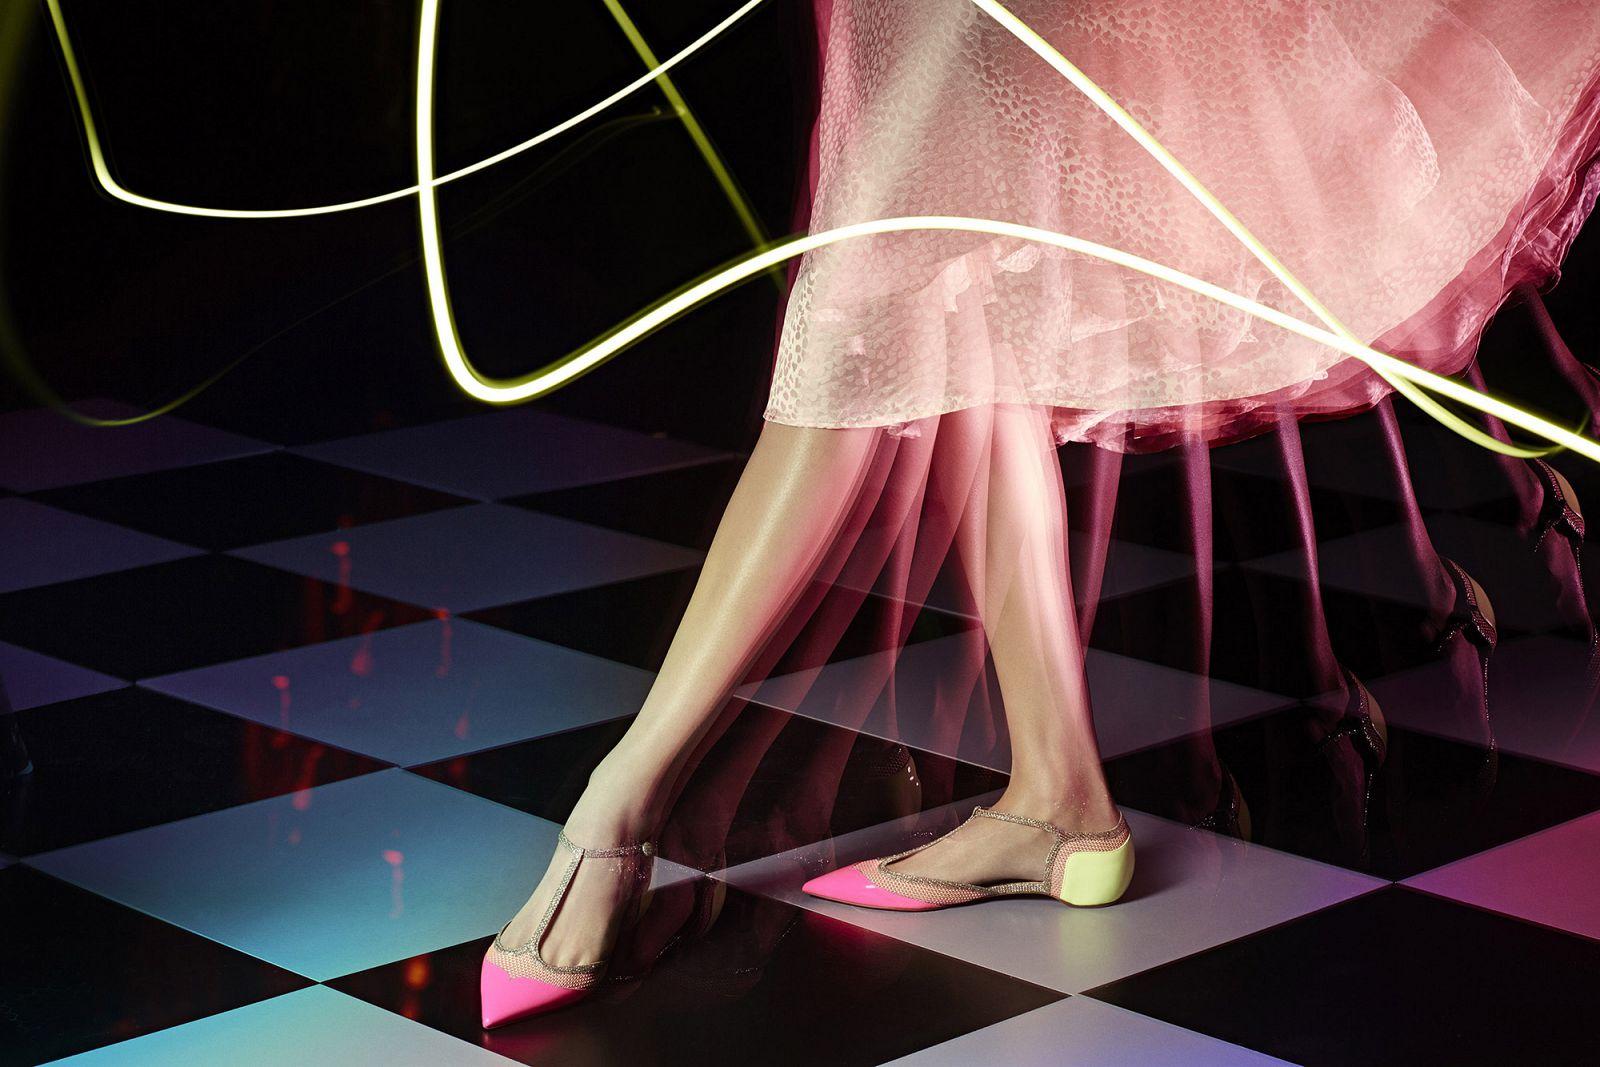 cheap christian louis vuitton shoes - christian louboutin tri-color paulina slingback pumps, boutin shoes